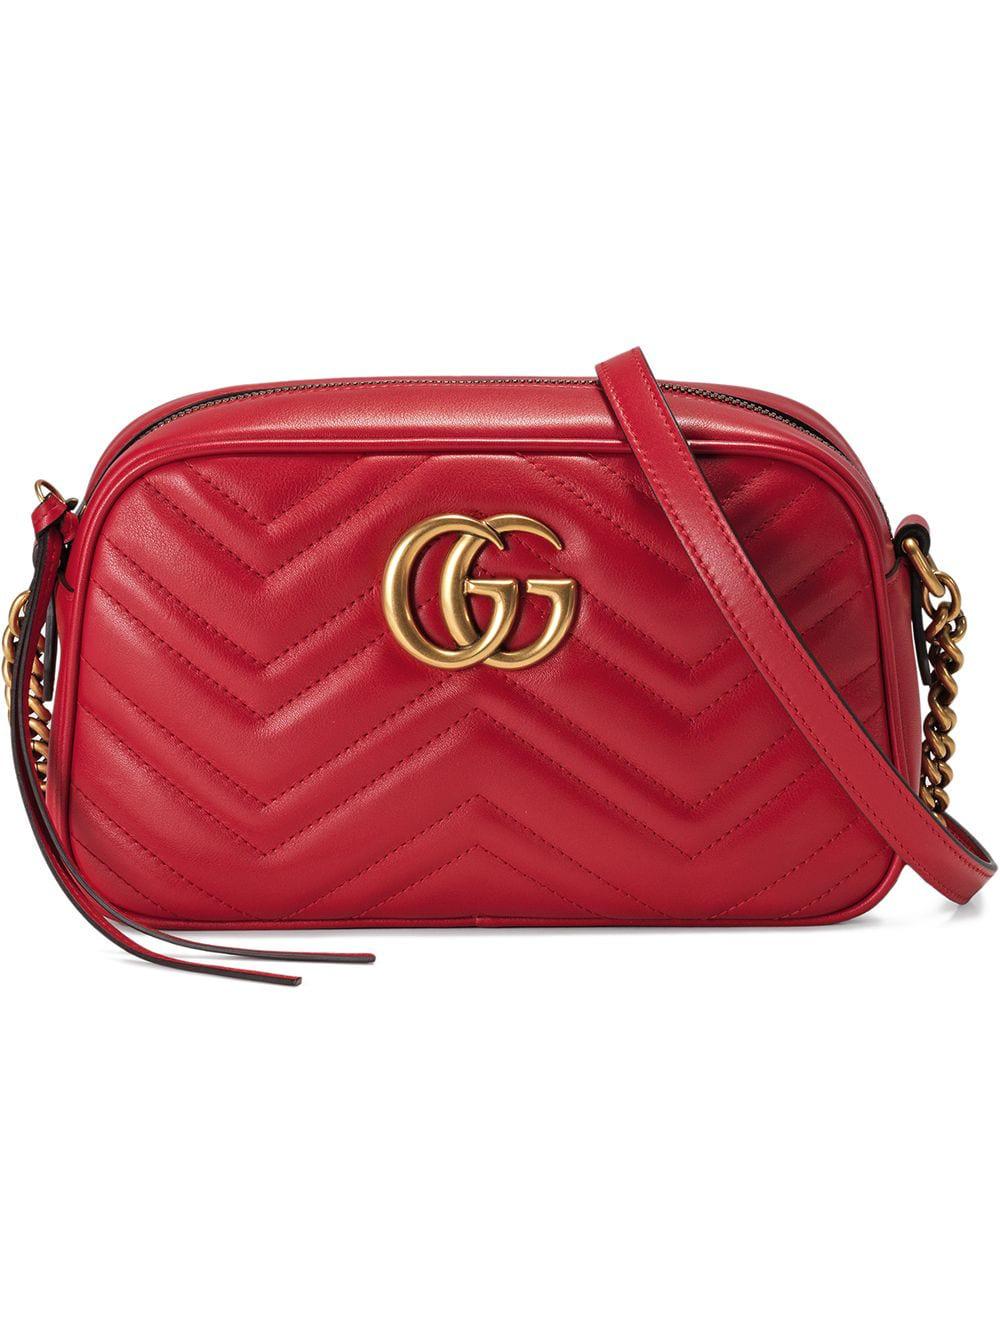 04d92c66016 Gucci  Gg Marmont  Schultertasche Aus Matelassé-Leder - Rot In Red ...